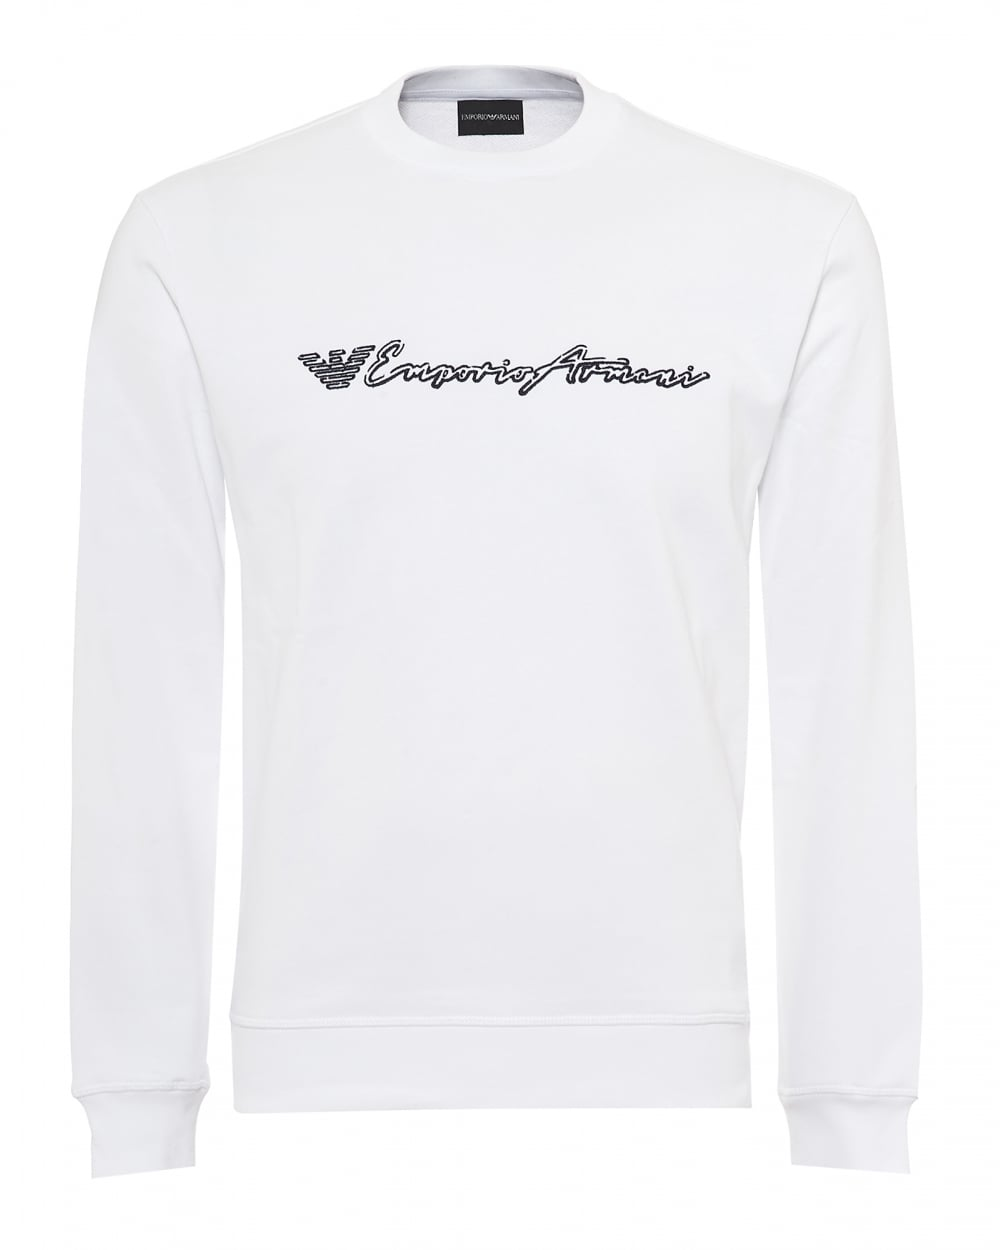 ddefbb0d30 Mens Script Logo Sweatshirt, Regular Fit White Sweat